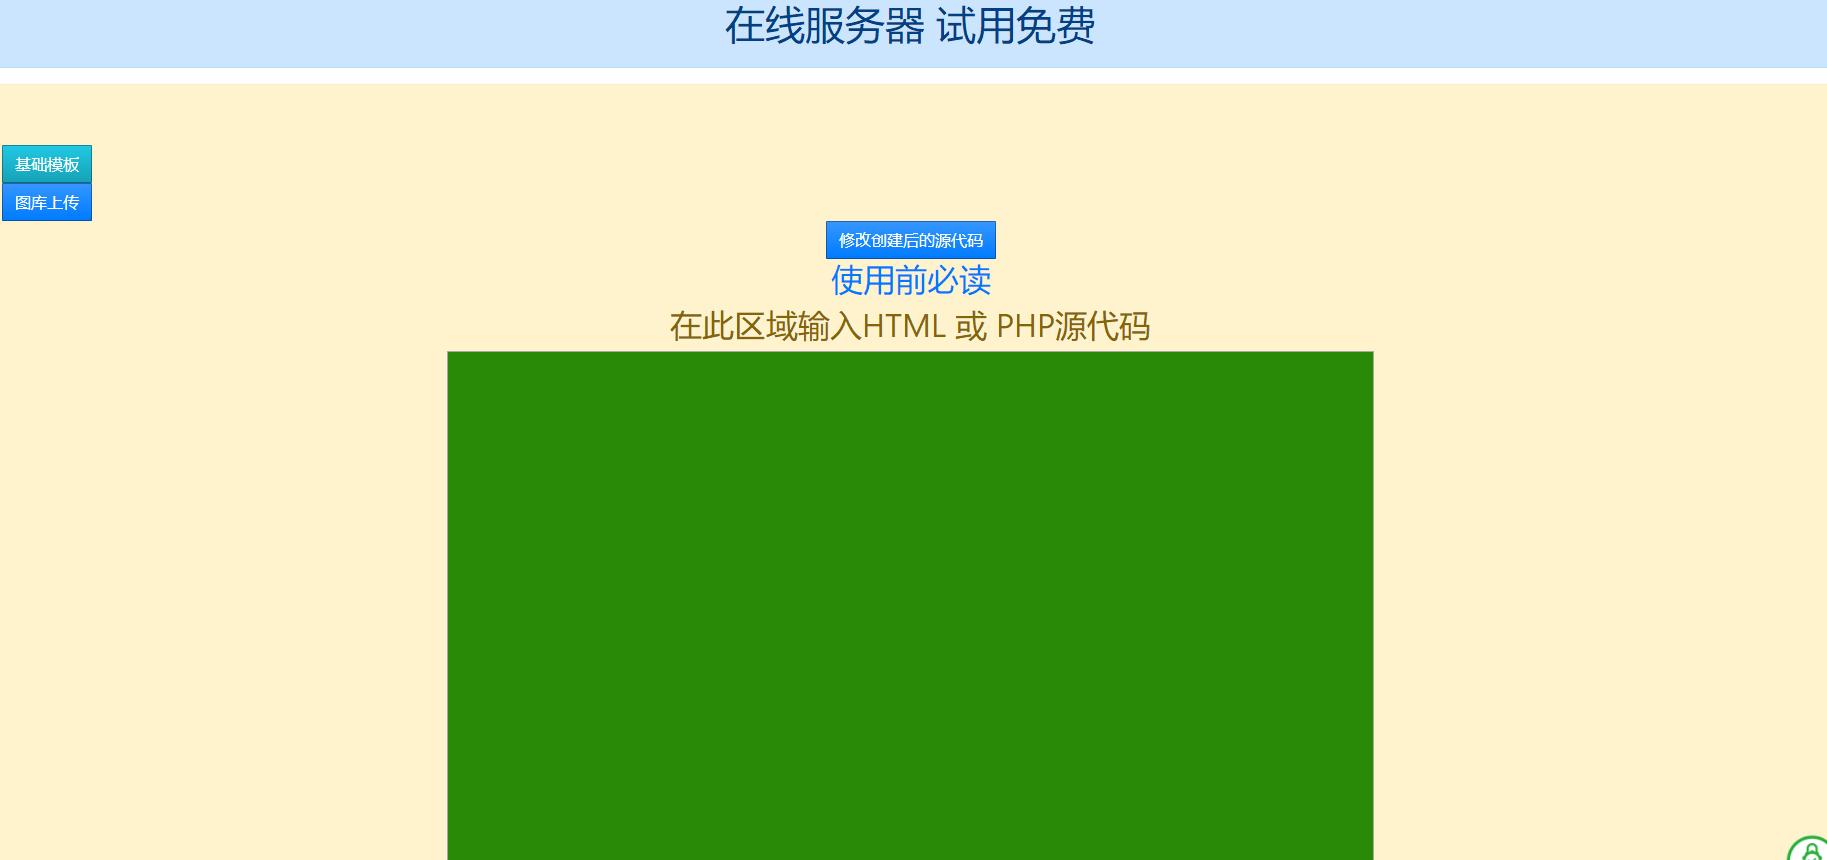 暗影互联HTML、PHP服务器更新